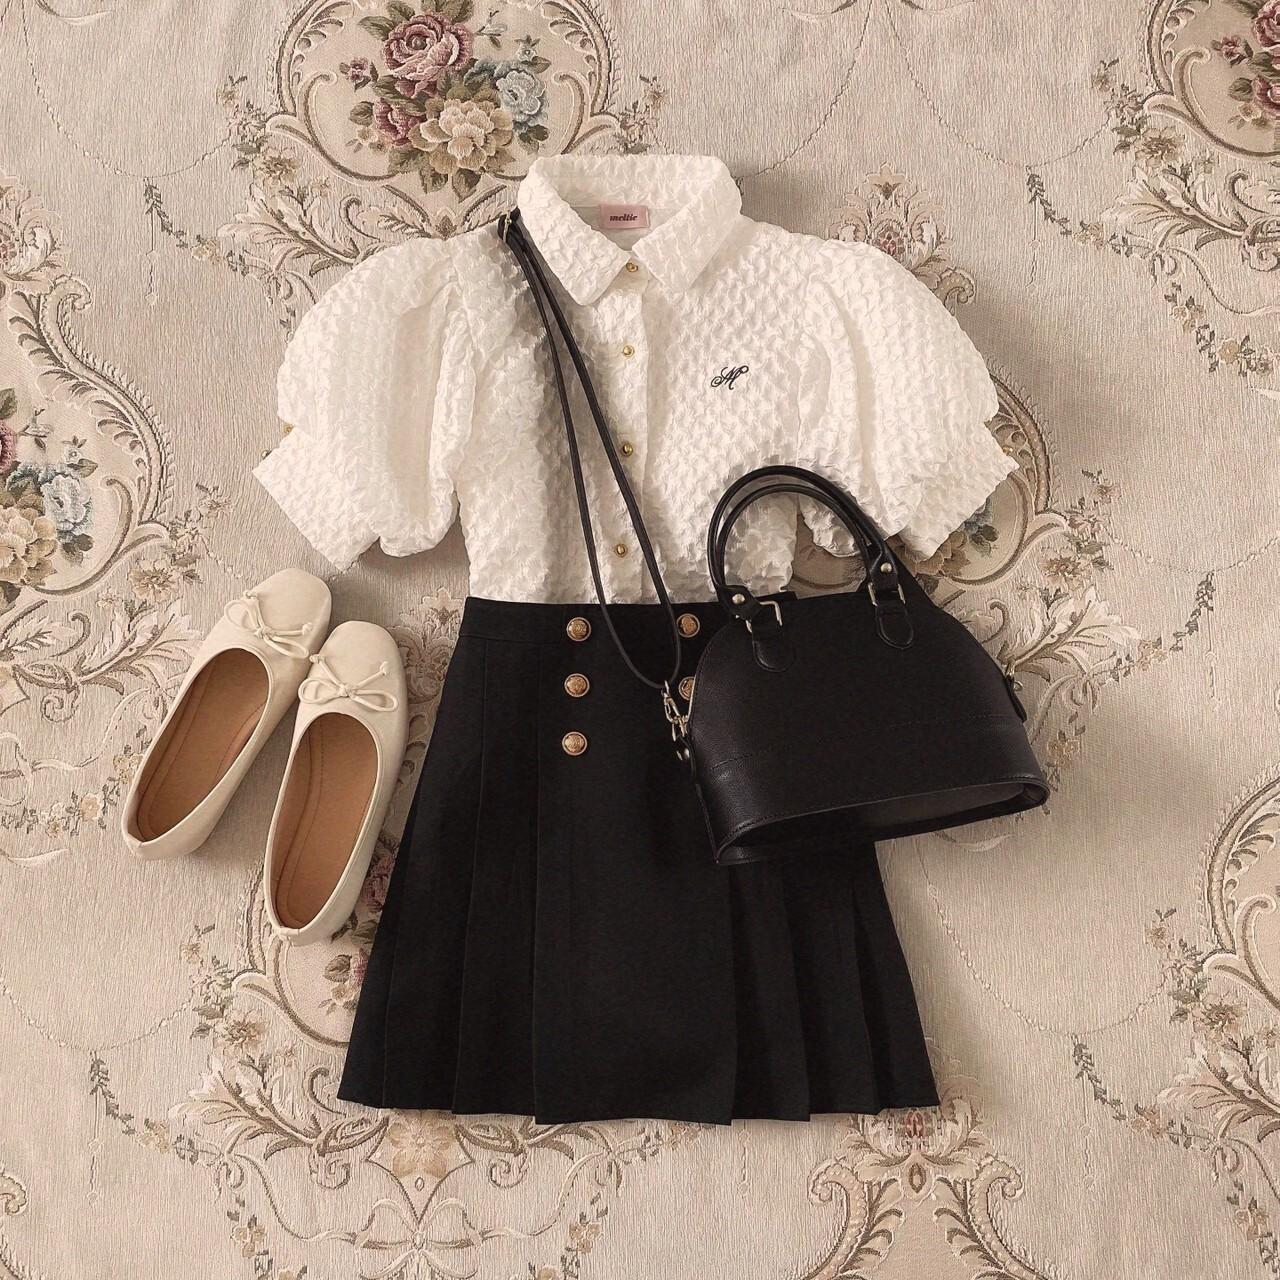 6/8締【meltie】gold button mini skirt